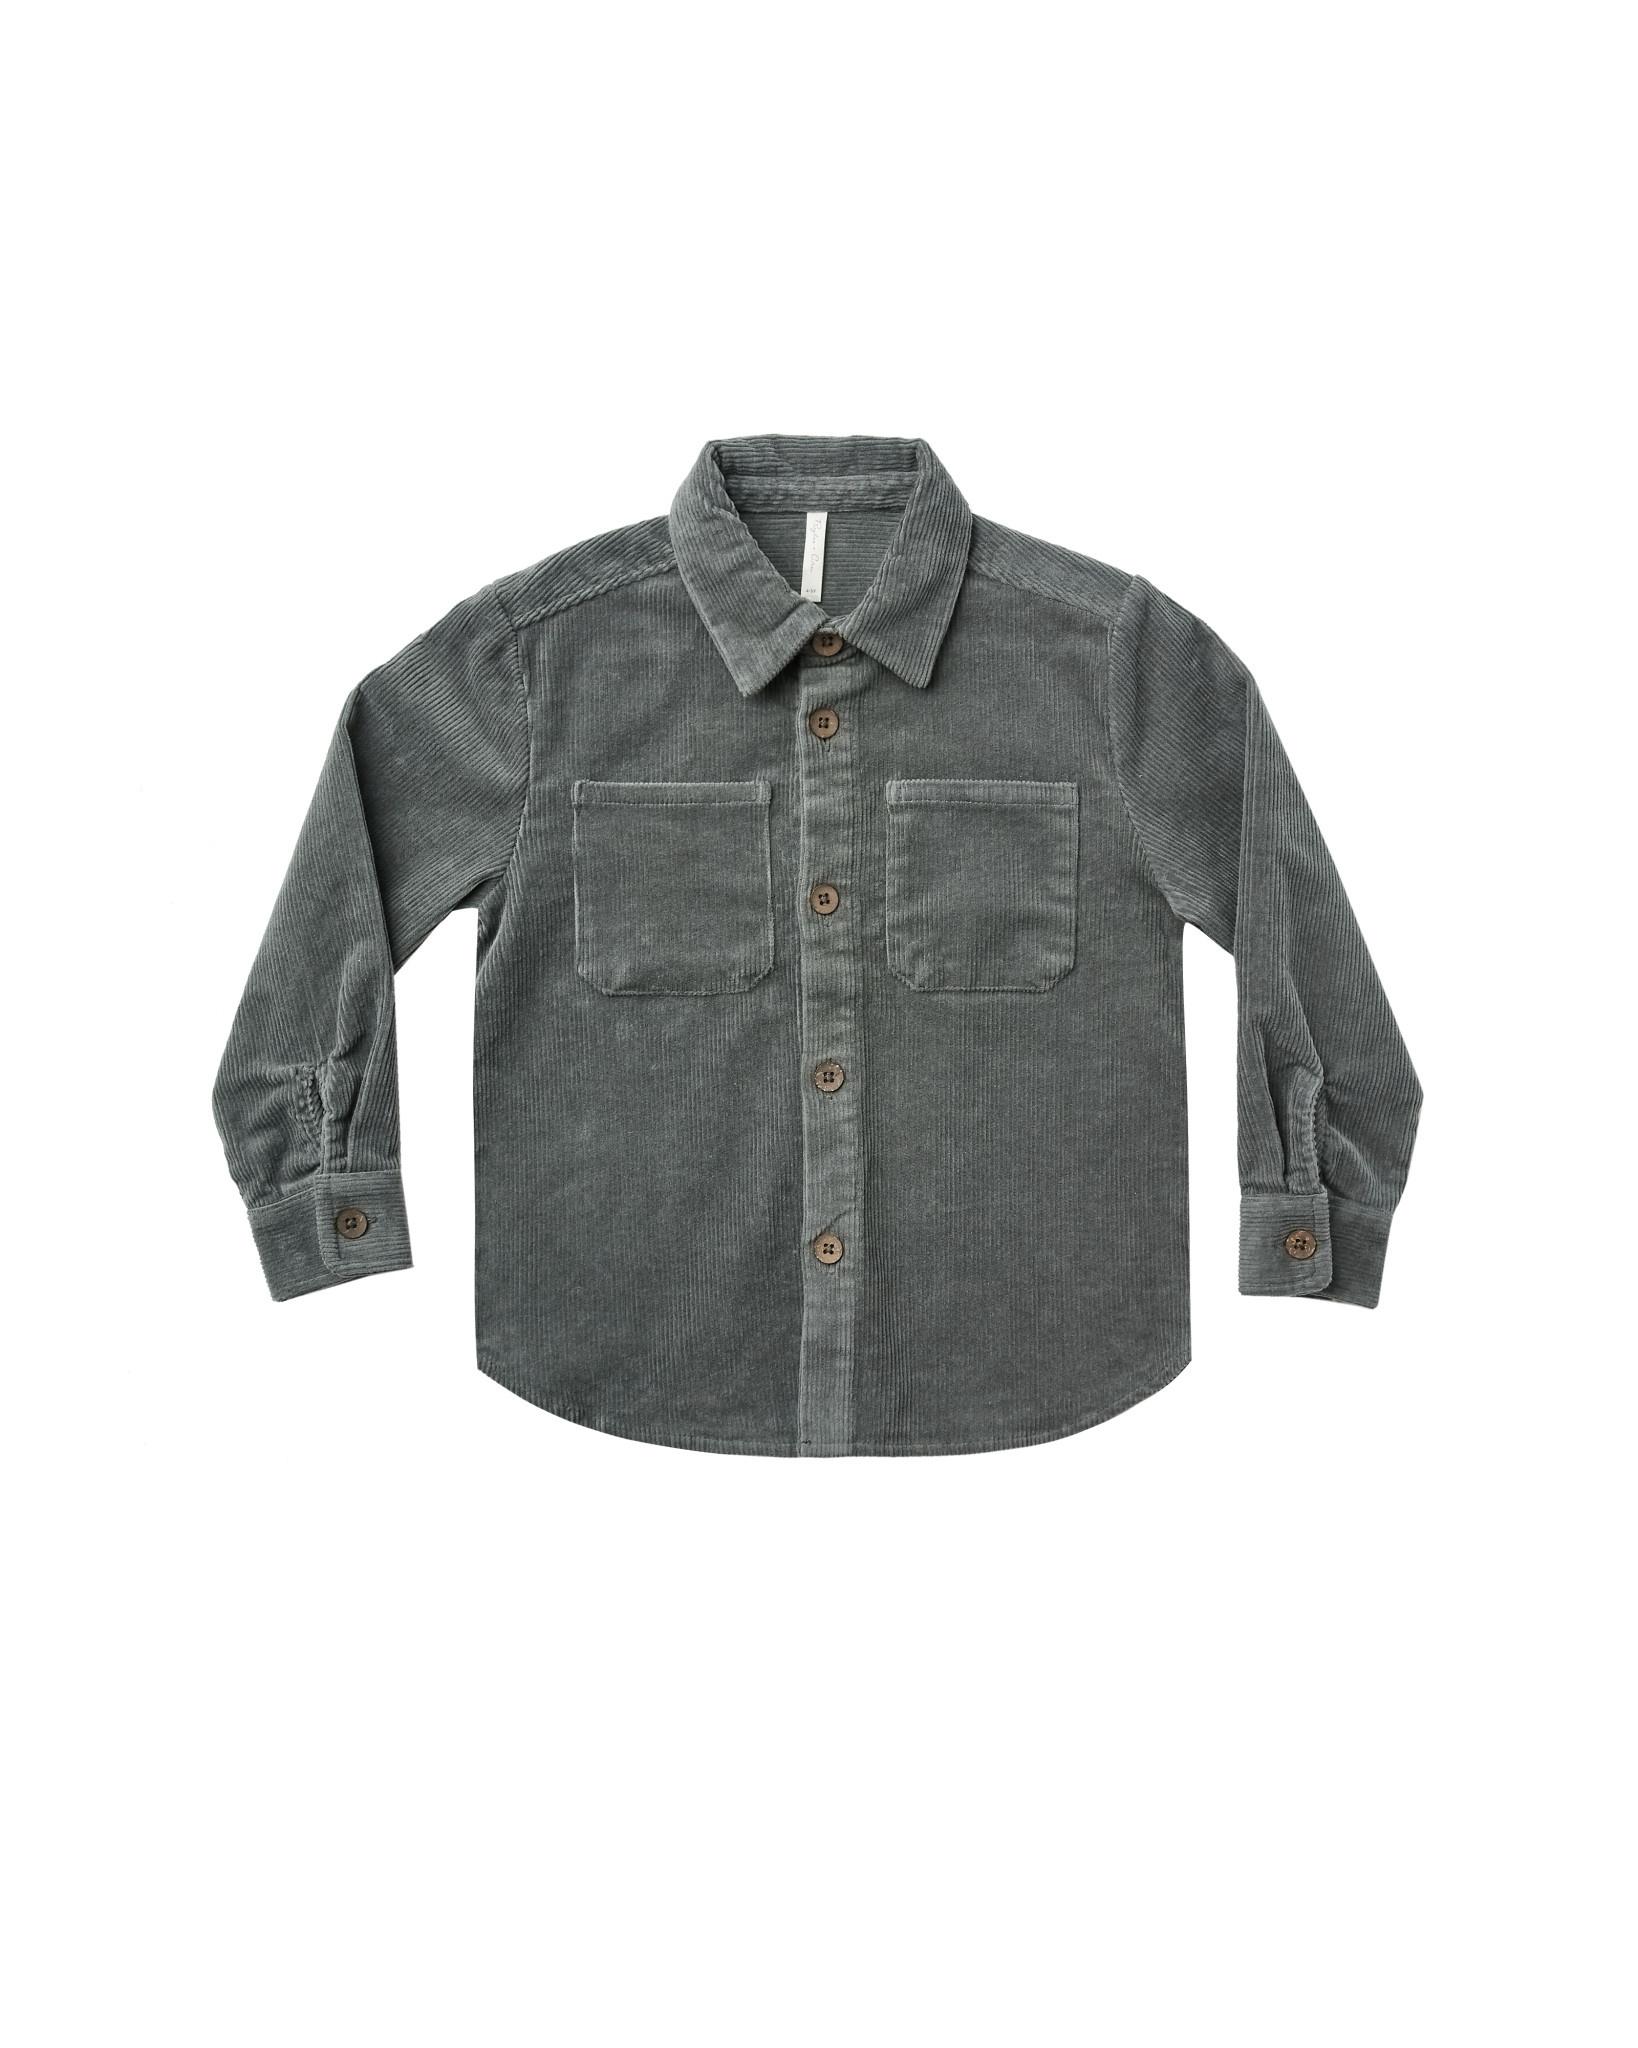 Rylee & Cru Corduroy Collared Shirt